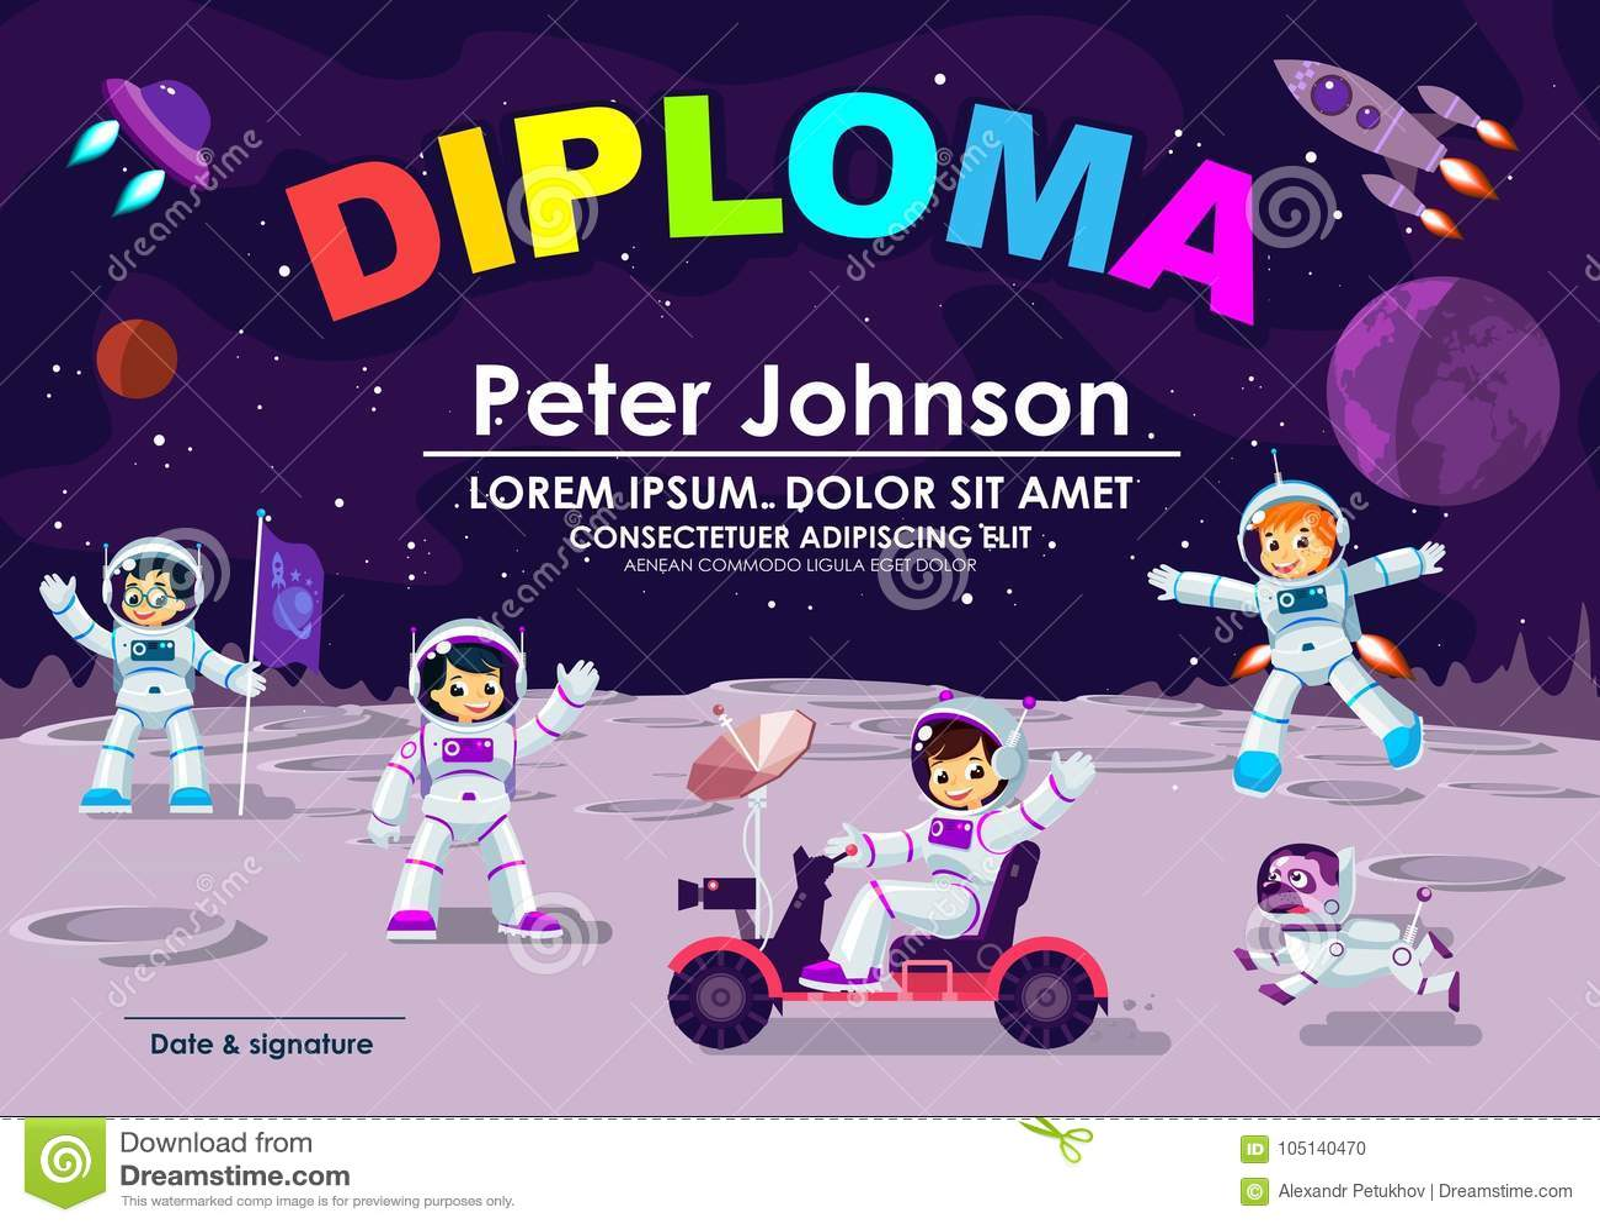 diploma design template